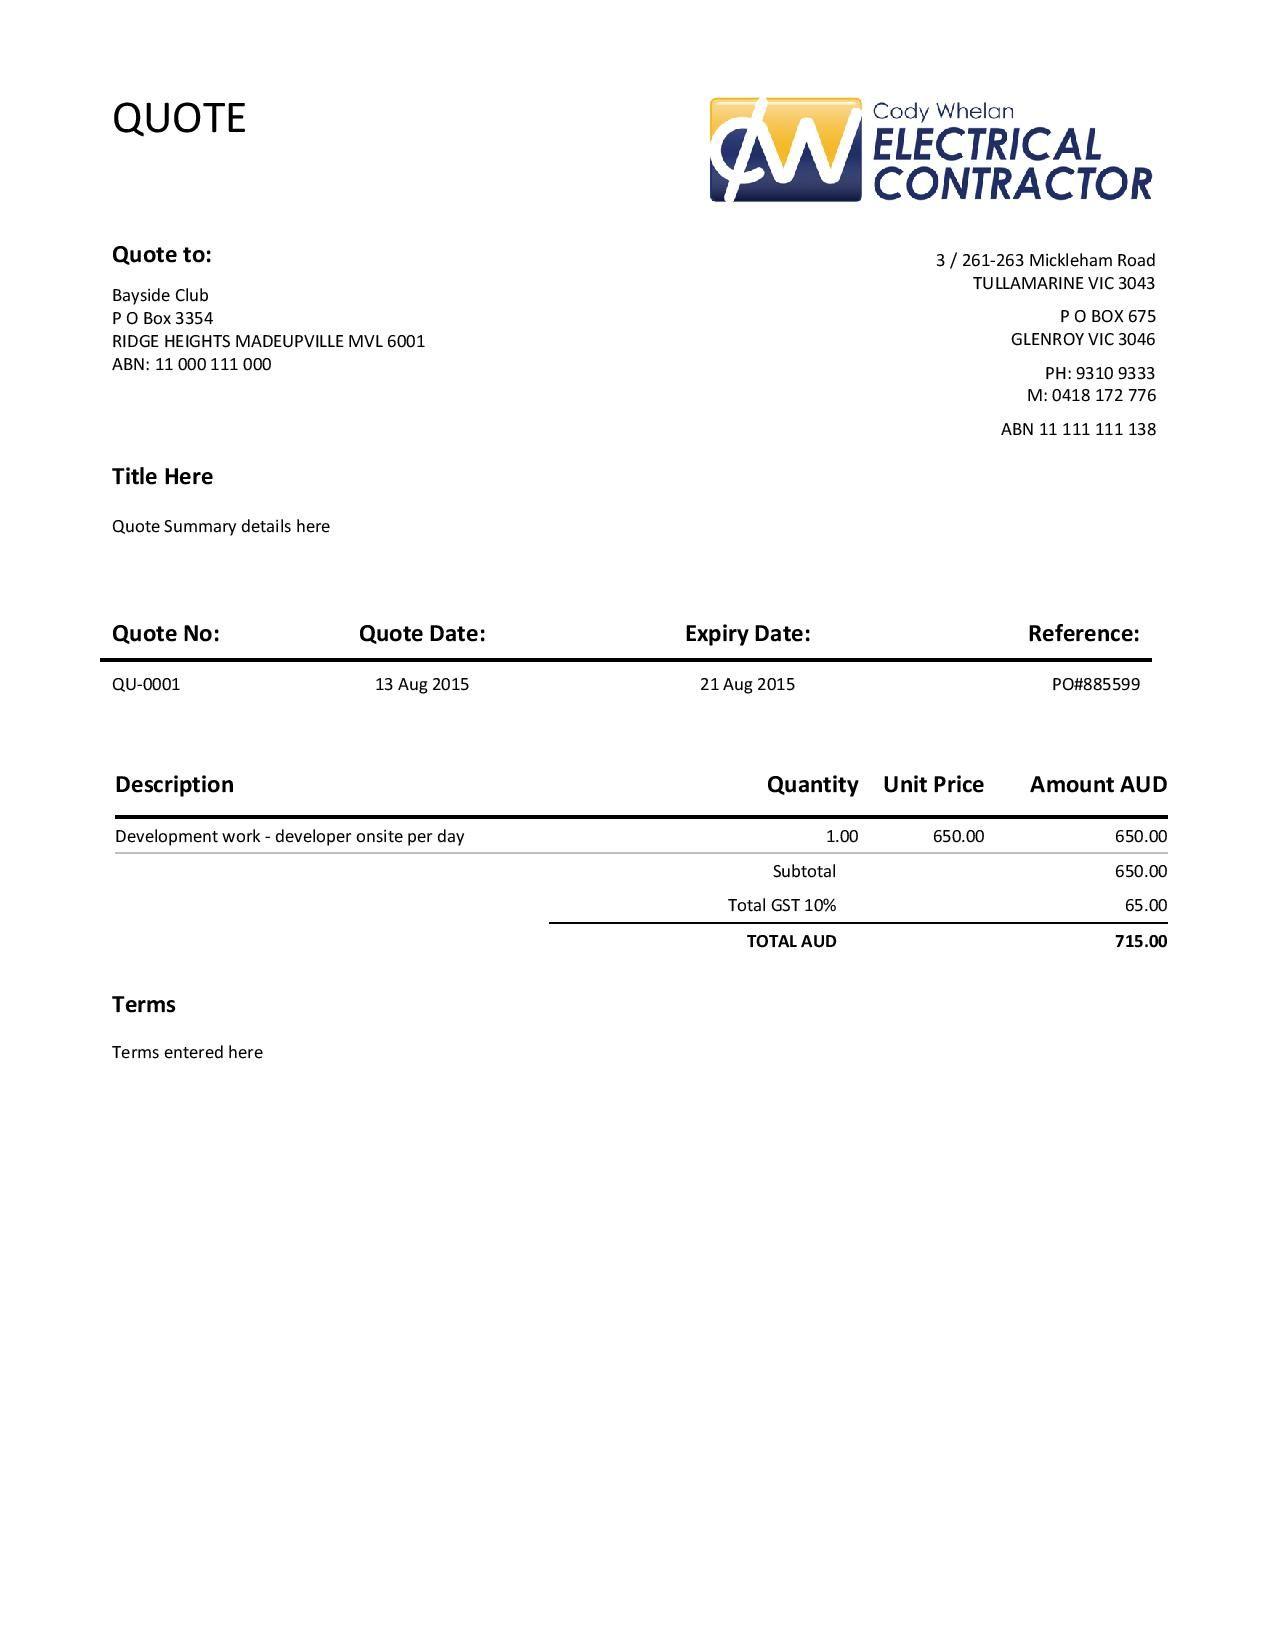 Delivery Docket Xero Customised Invoice  Xero Customized Templates  Pinterest